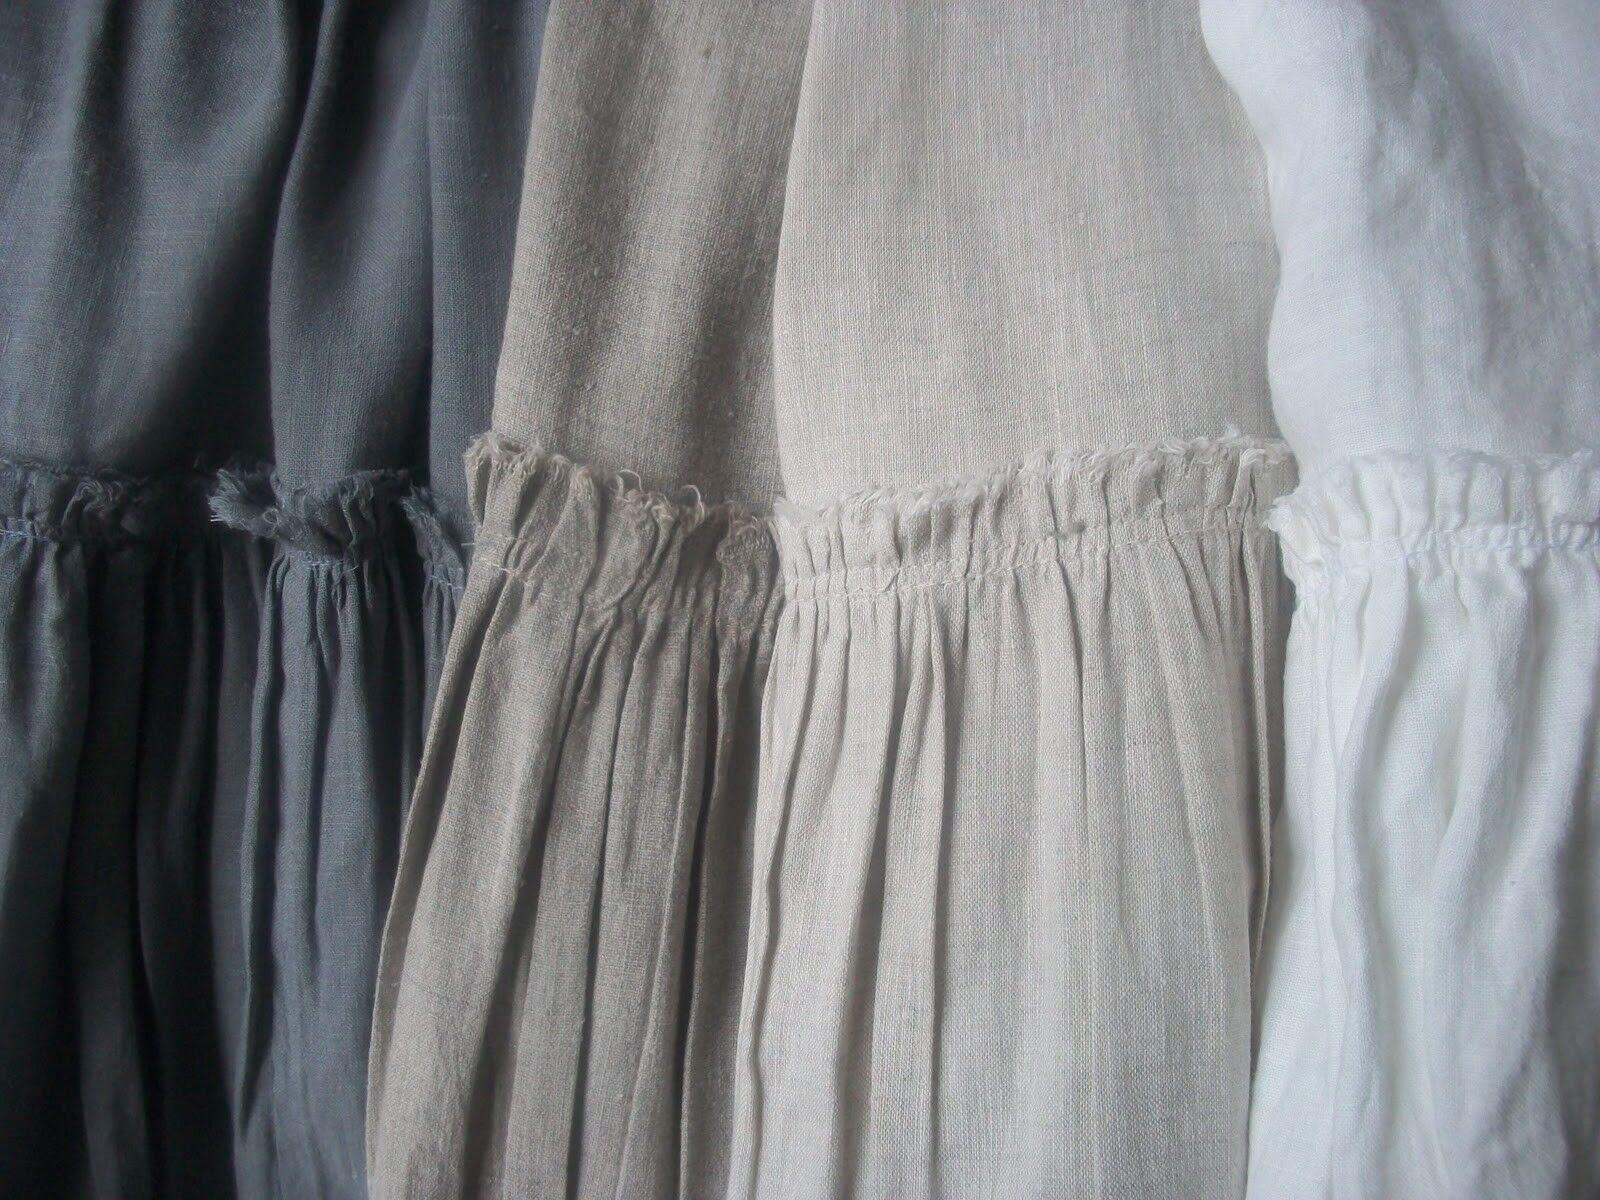 Pure Luxury Belgian Linen Cotton Curtain Drape Panel Panel Panel Ruffle Pleat Hem 96